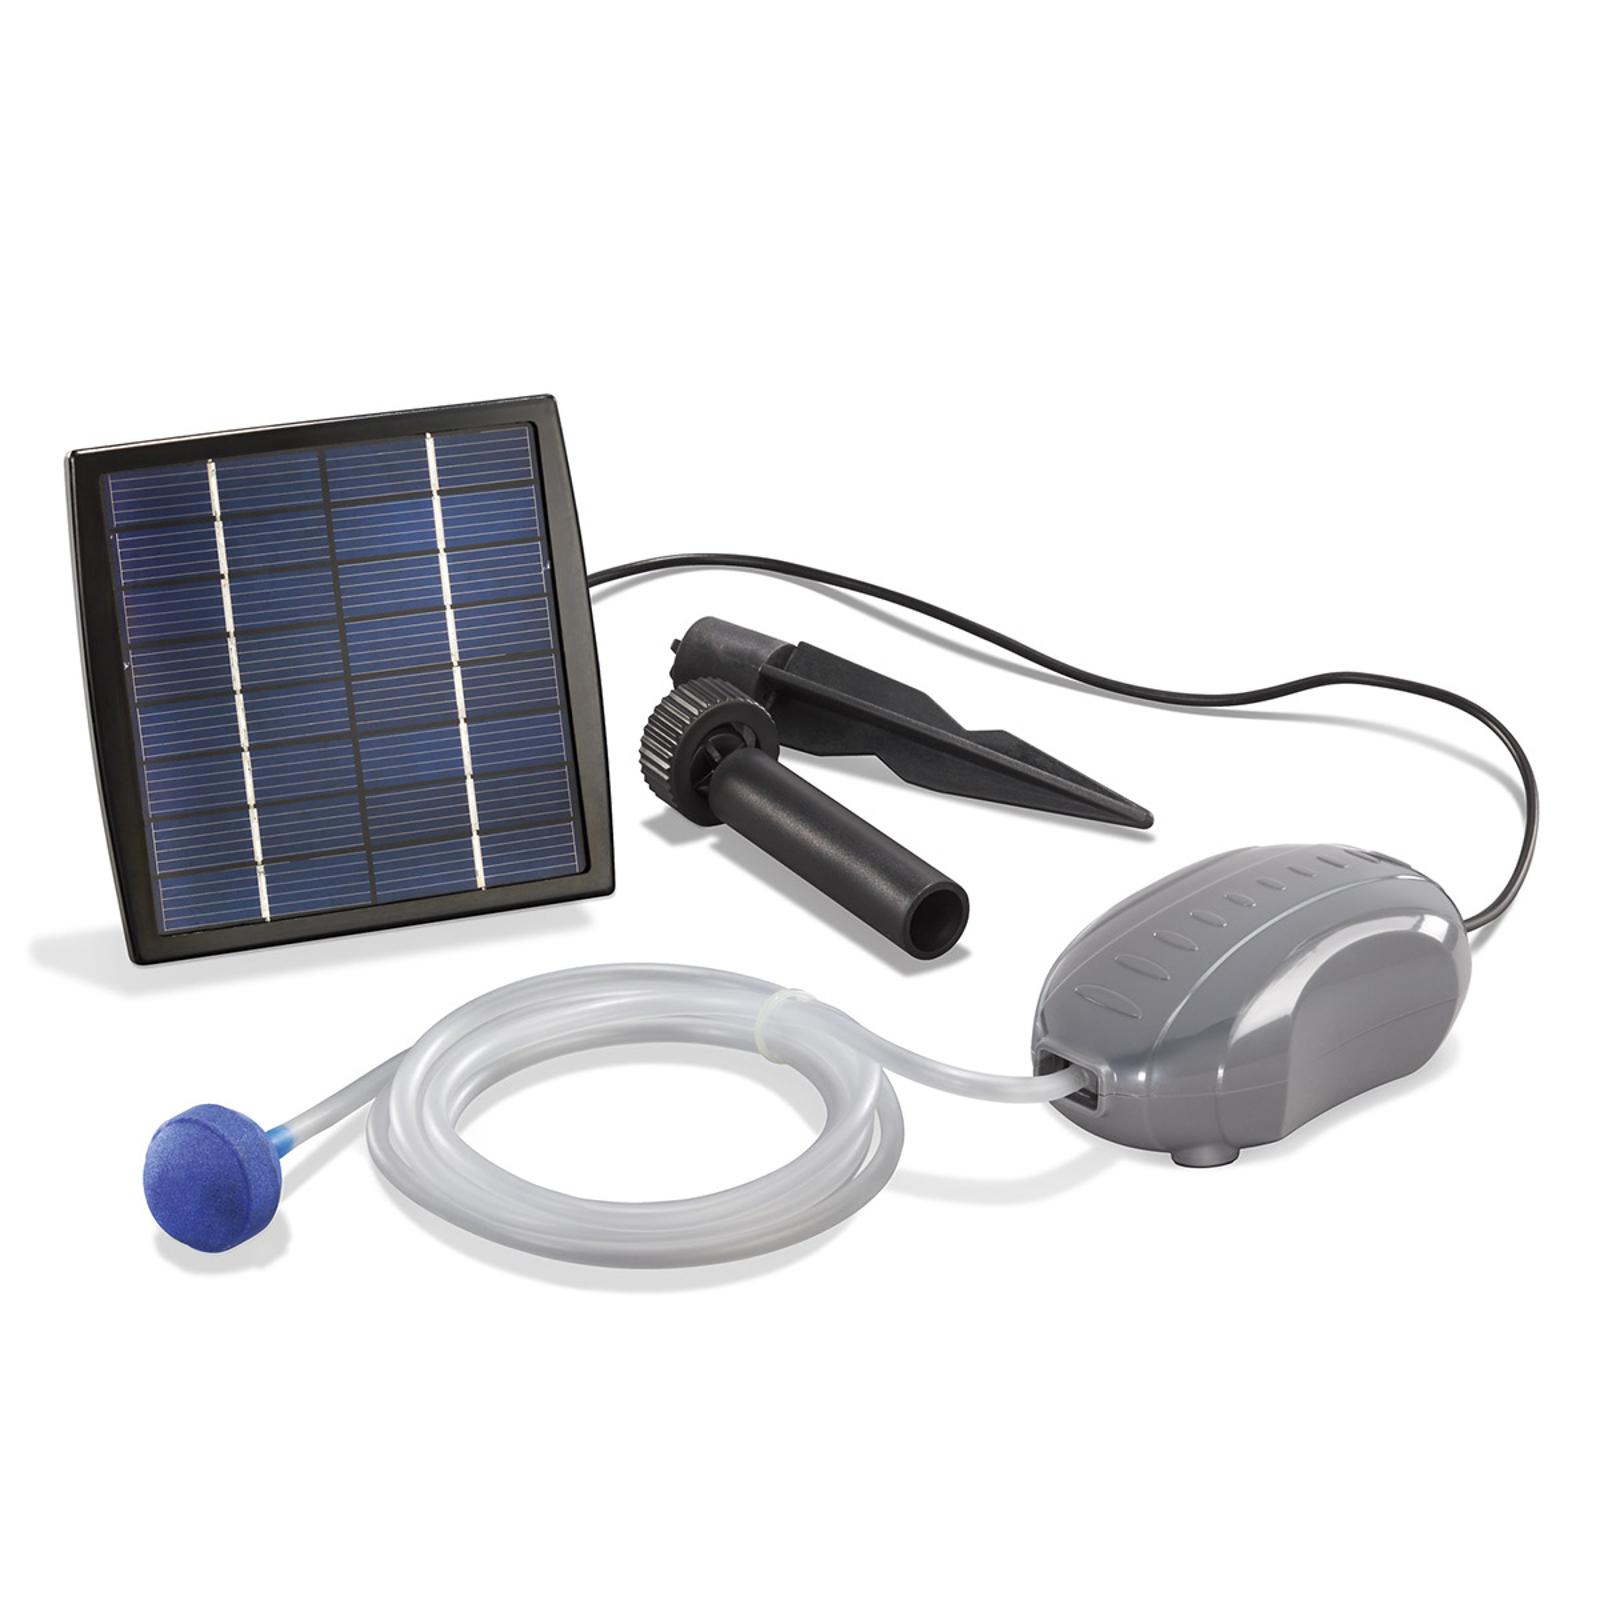 Aeratore idrico SOLAR AIR-S a energia solare